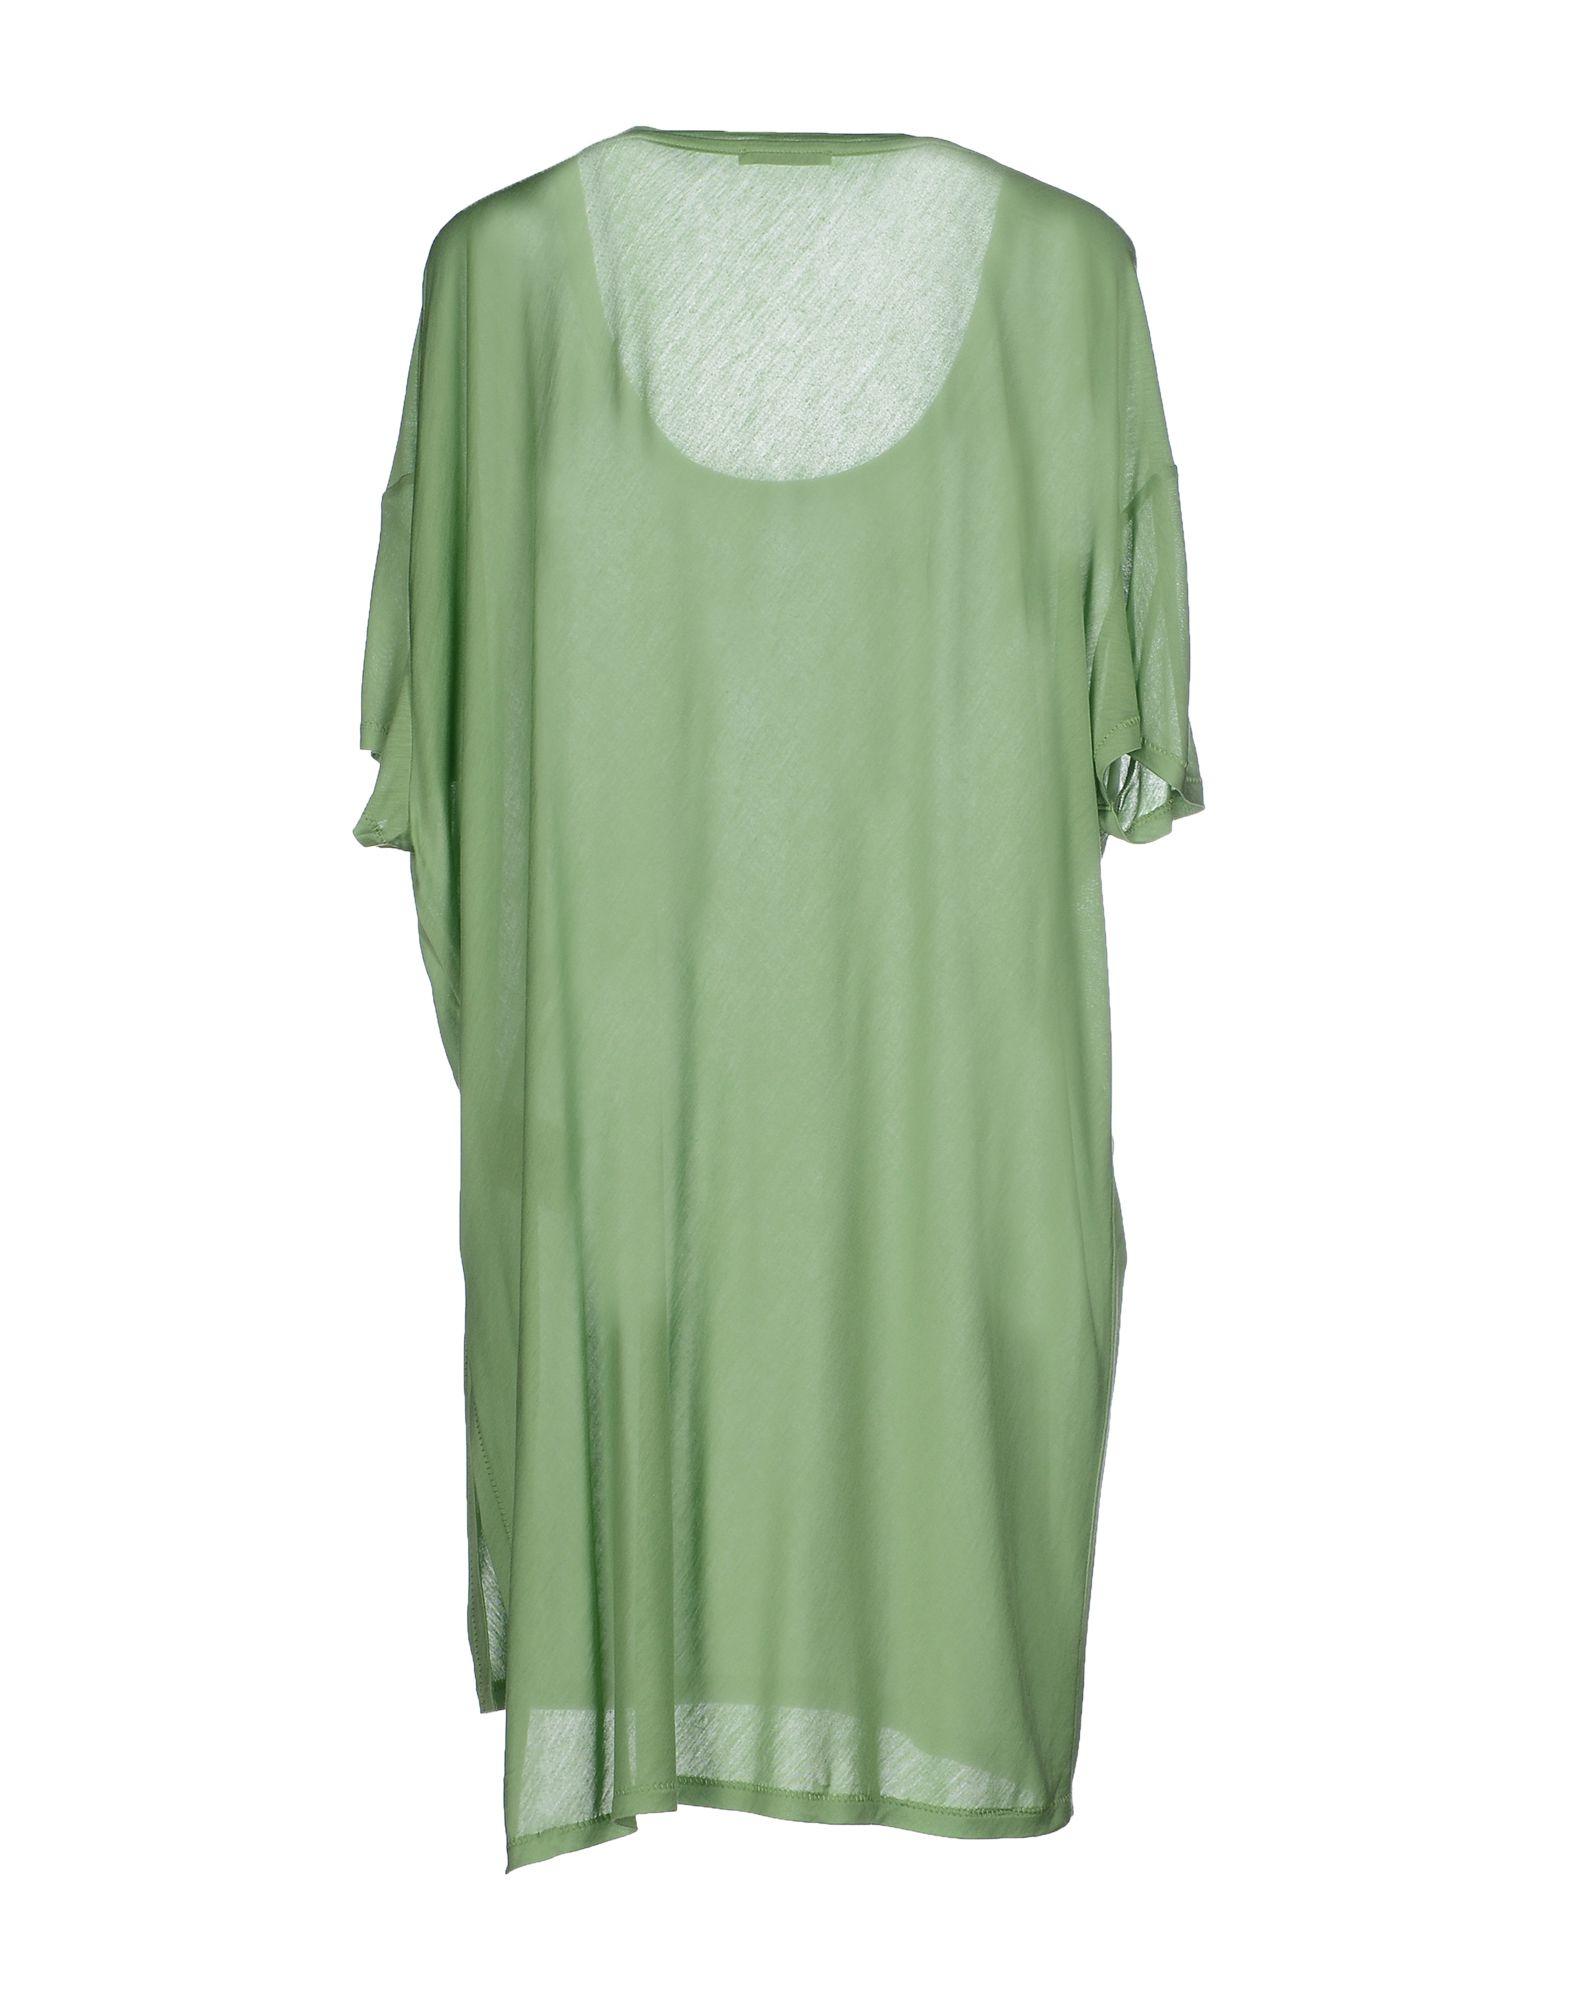 Lyst Acne Studios T Shirt In Green